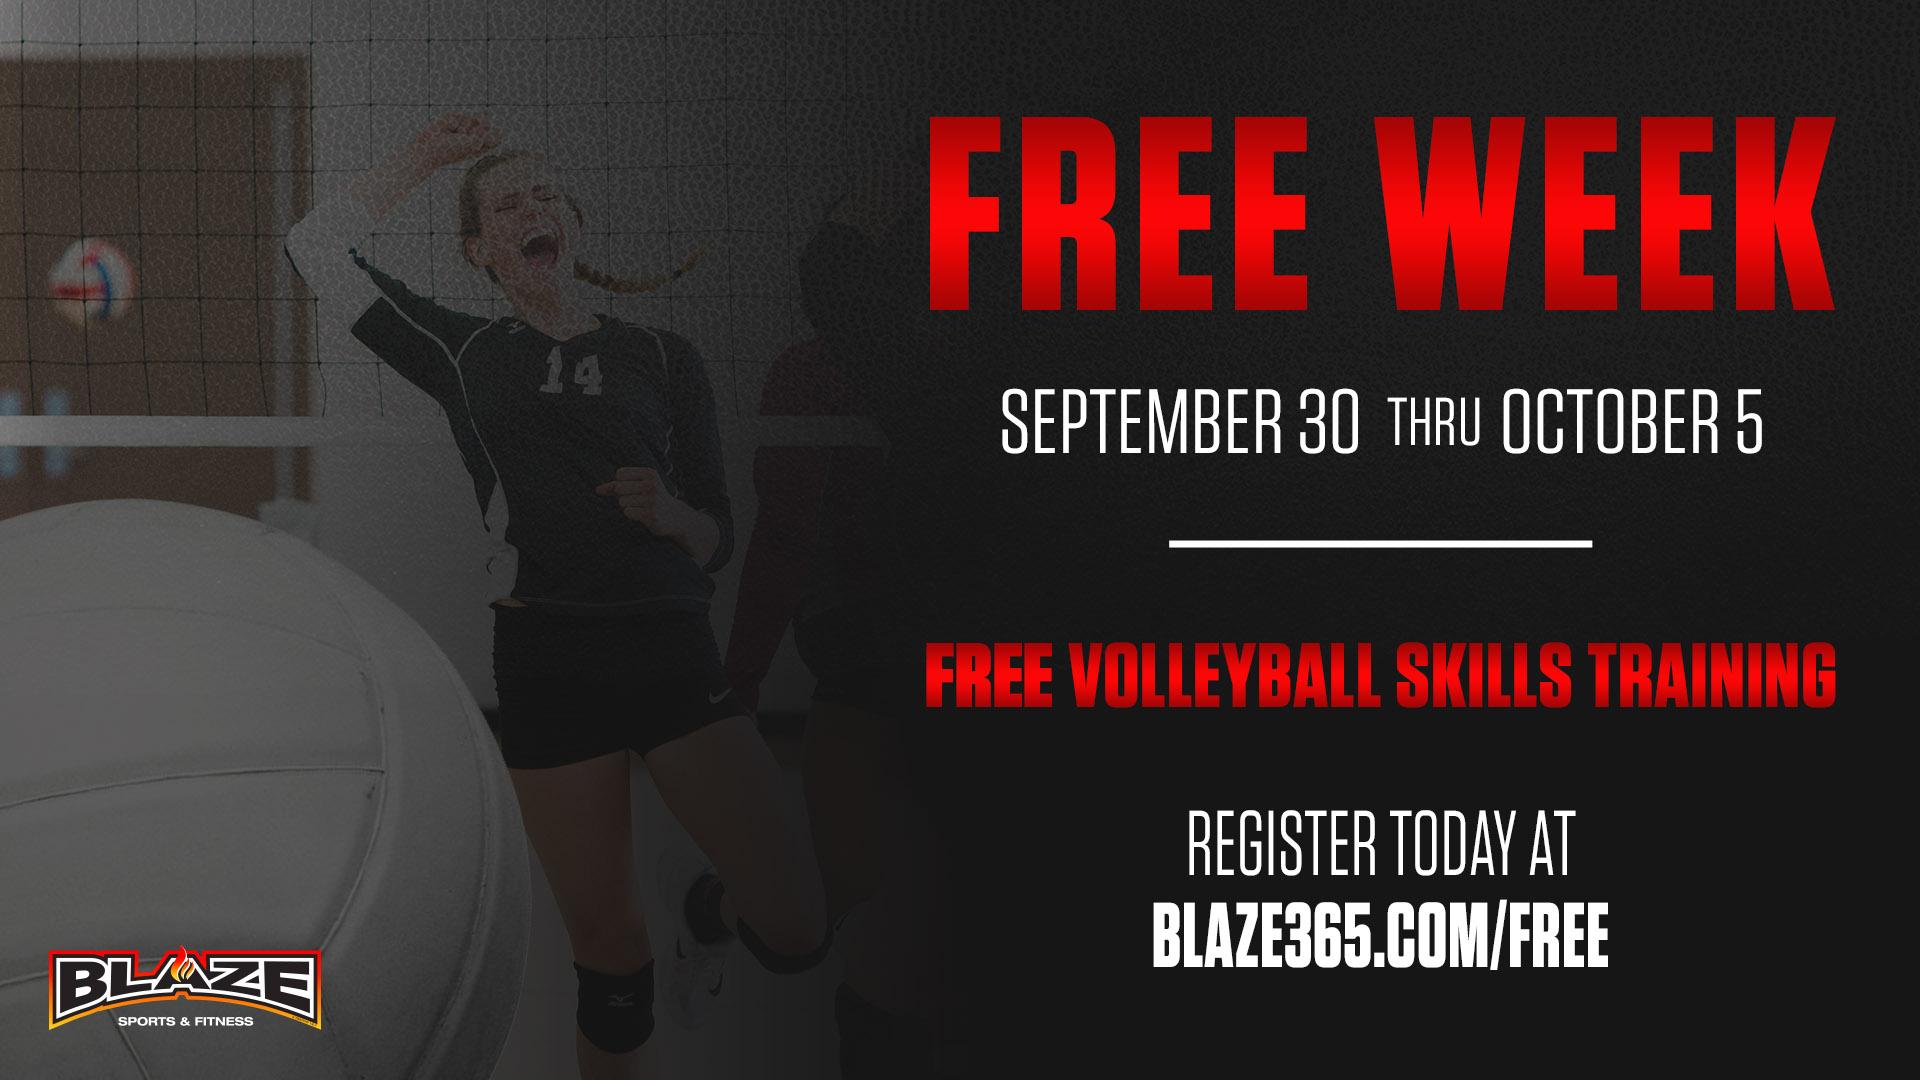 Blaze volleyball skills training free